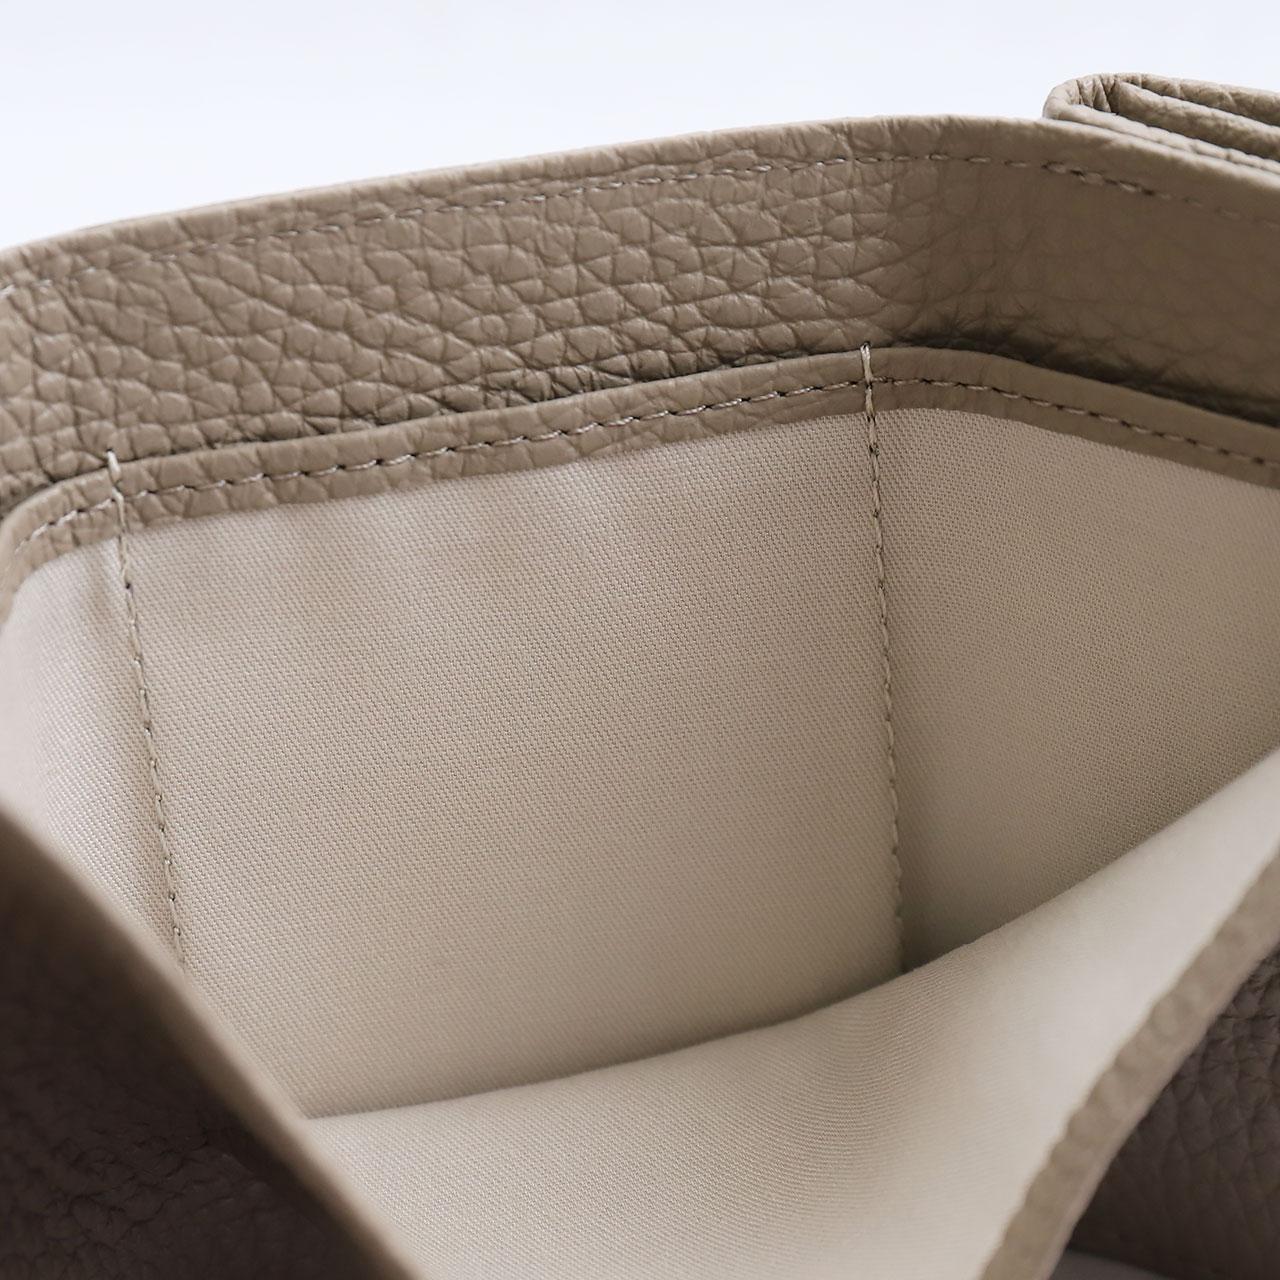 三つ折り財布内側生地。